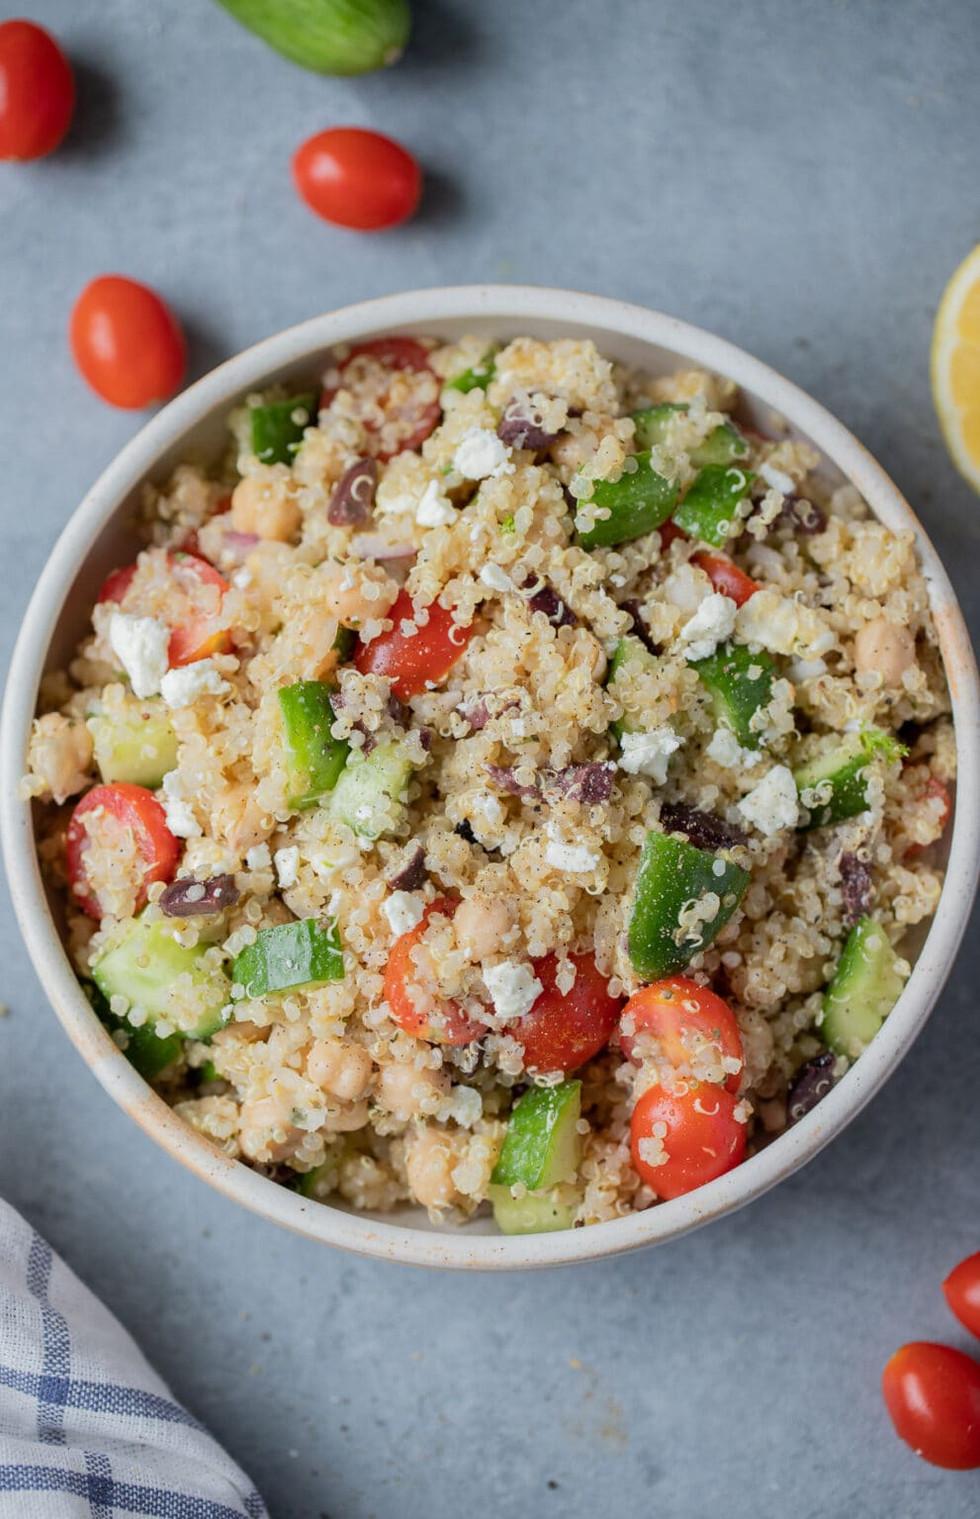 Healthy Recipe Roundup: #1